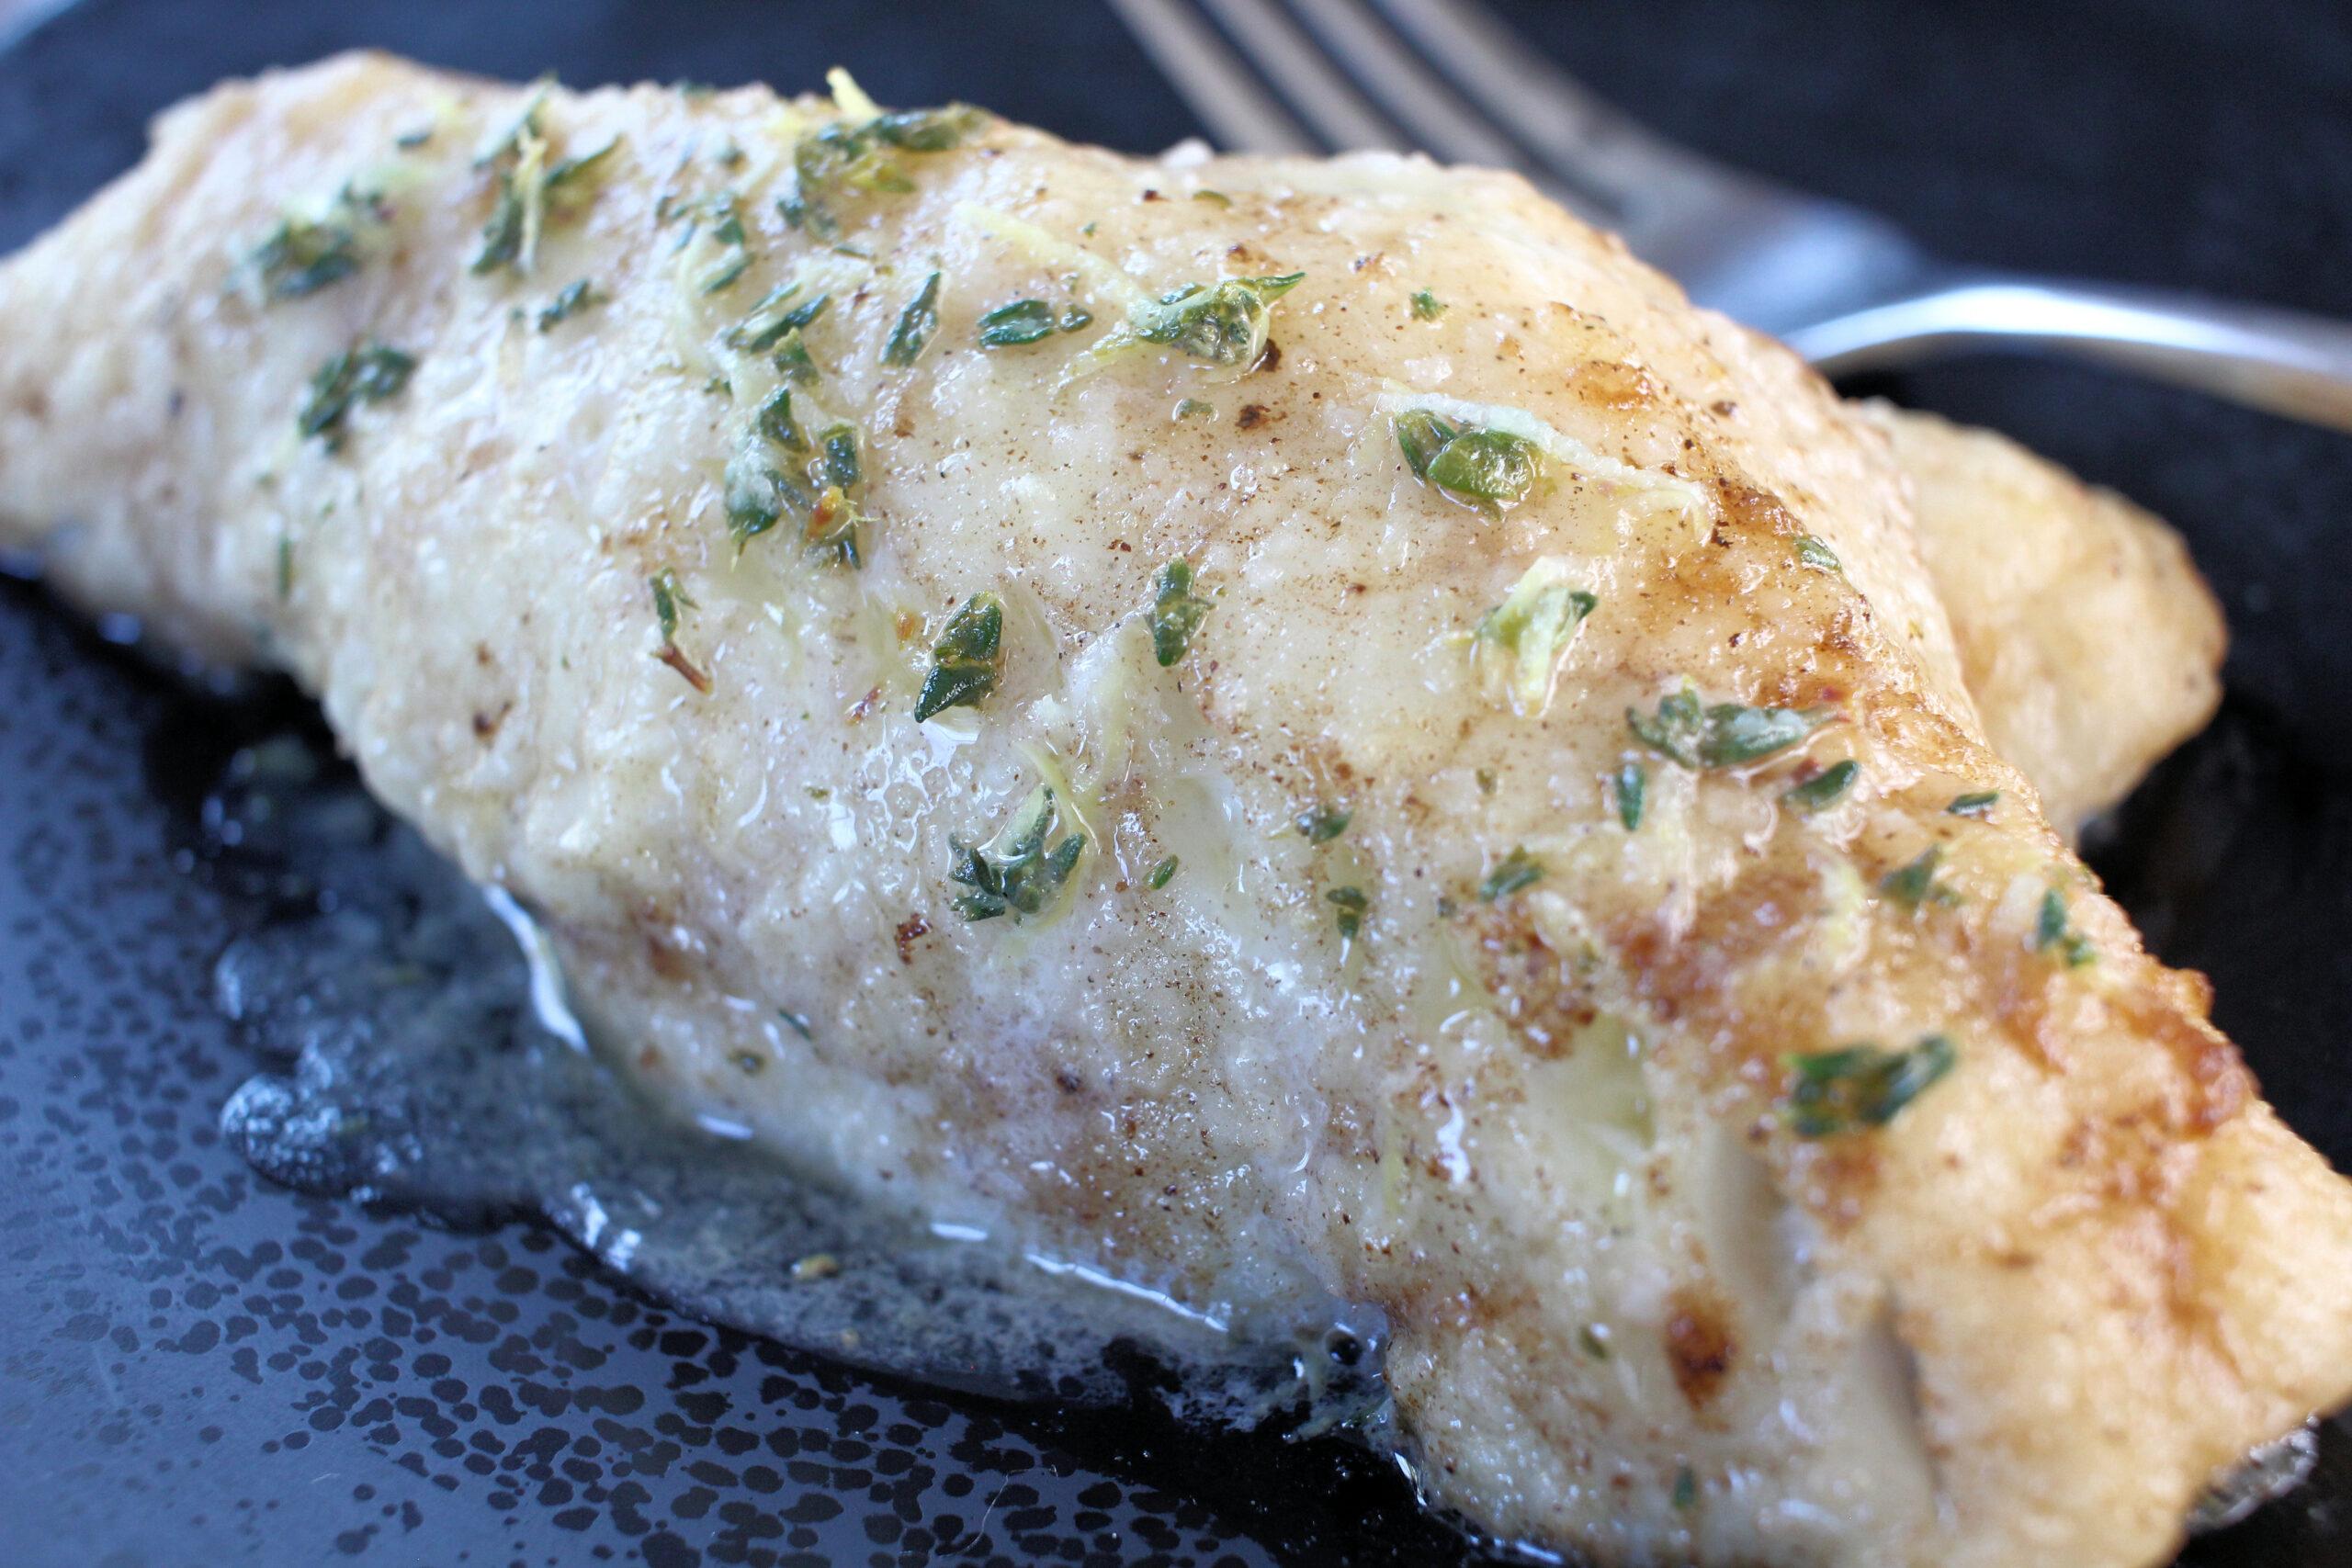 Sautéed Black Sea Bass with Lemon-Thyme Sauce, courtesy of Vanda Lewis.